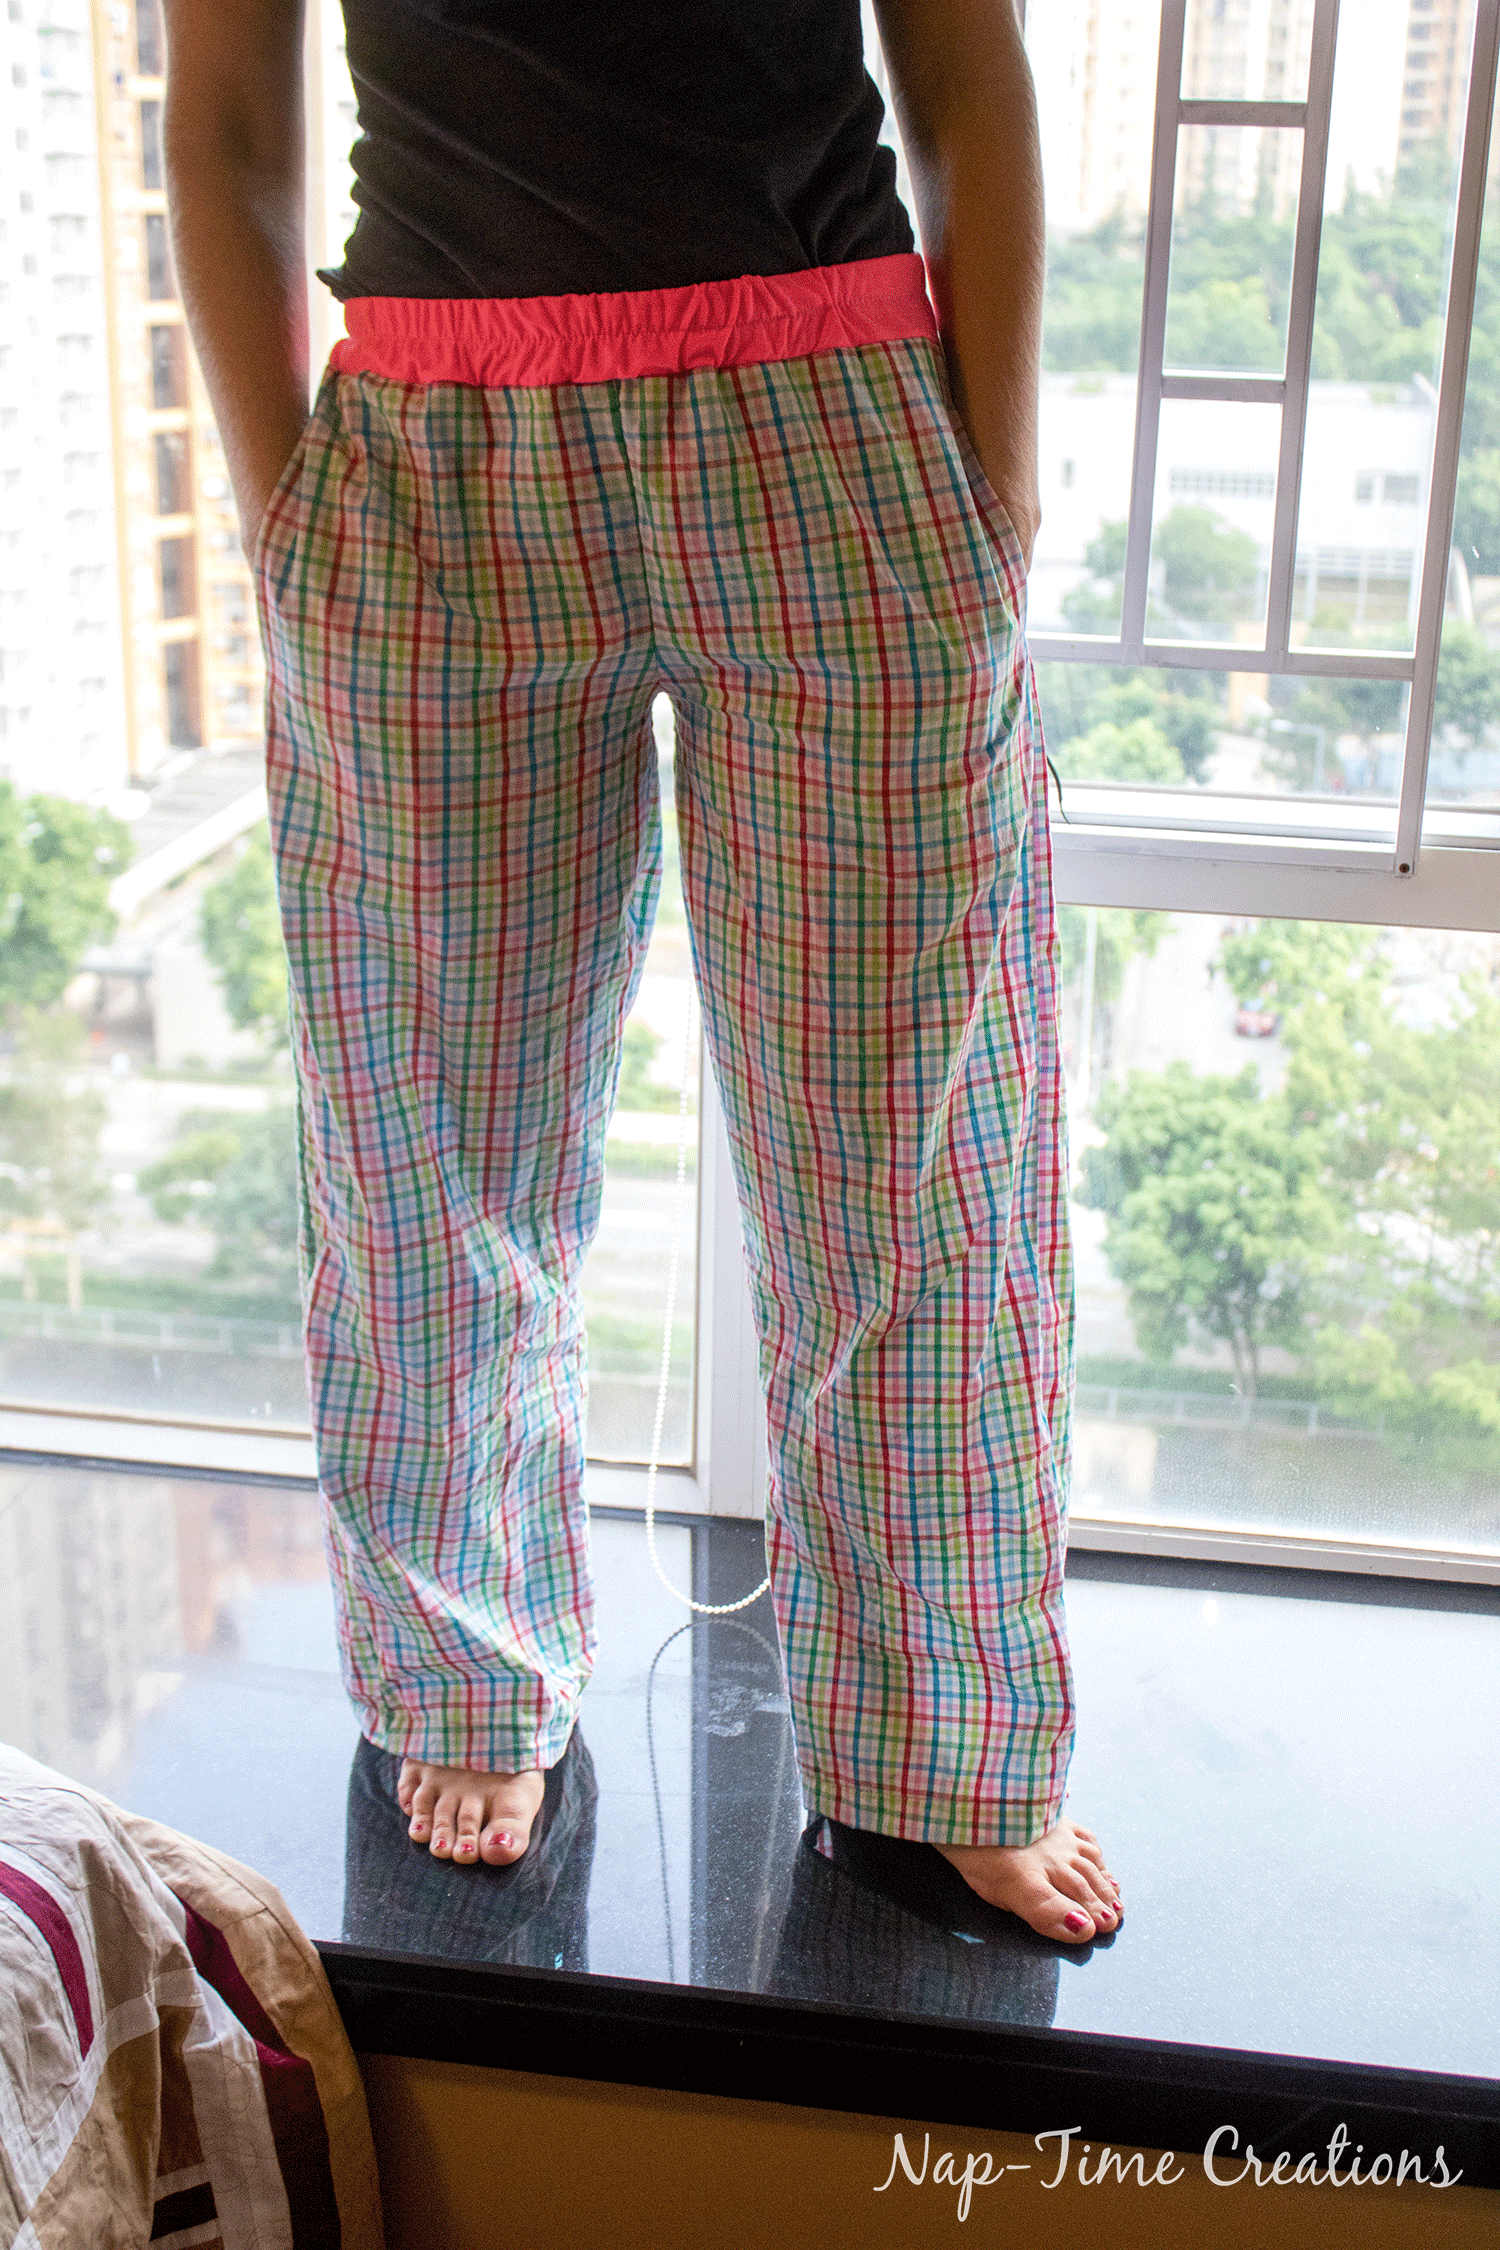 pj-lounge-pants-free-pattern-xxs-xxl-from-nap-time-creations-4